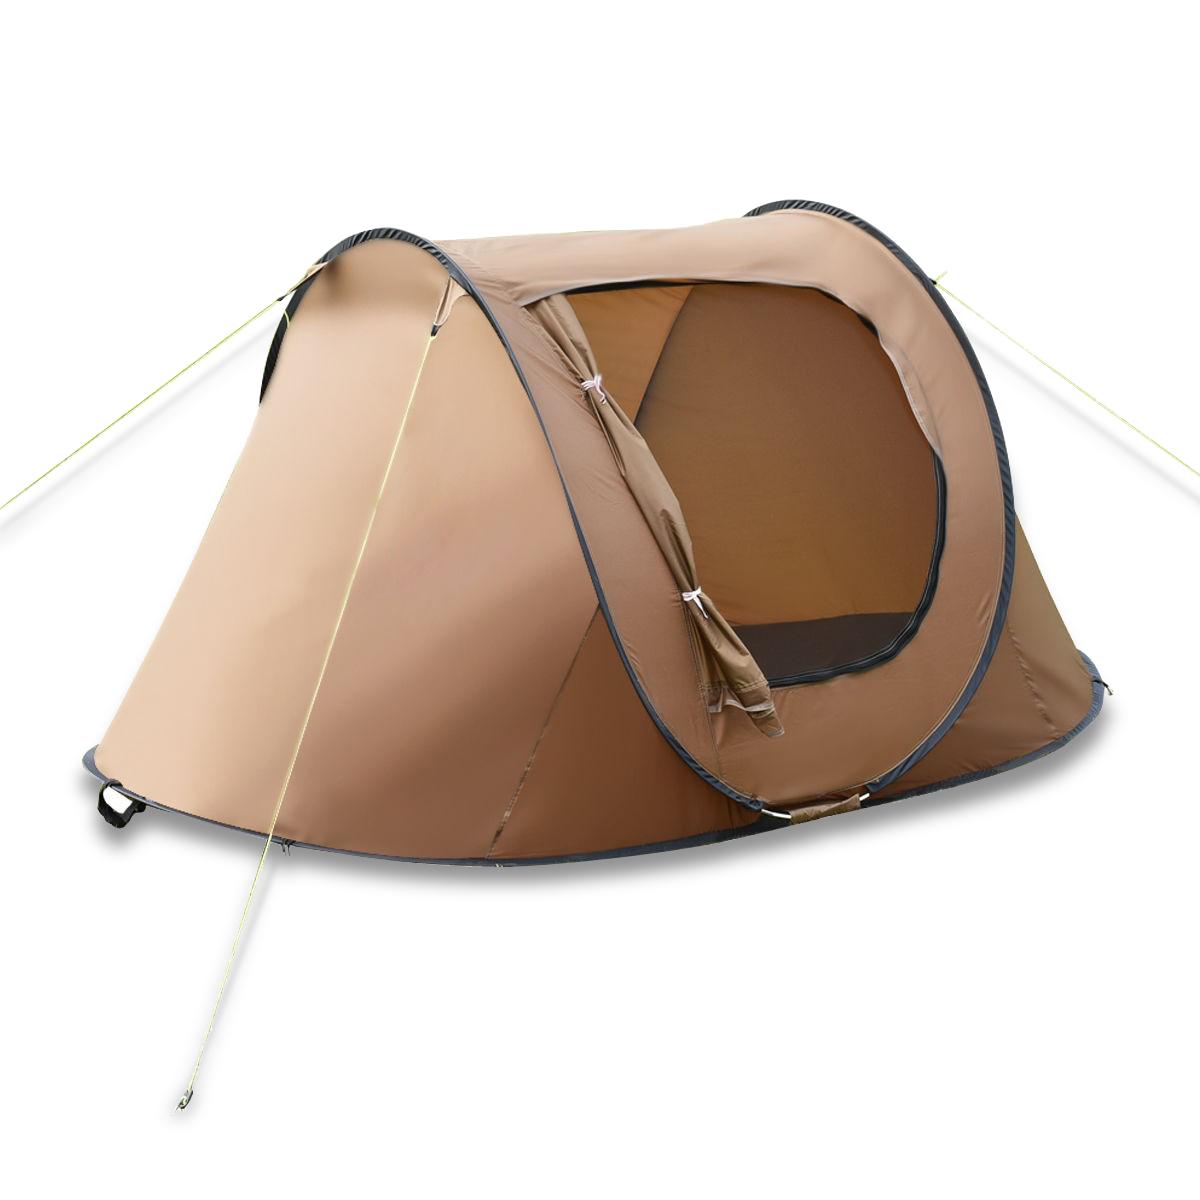 Waterproof 2-3 Person Camping Tent-Brown